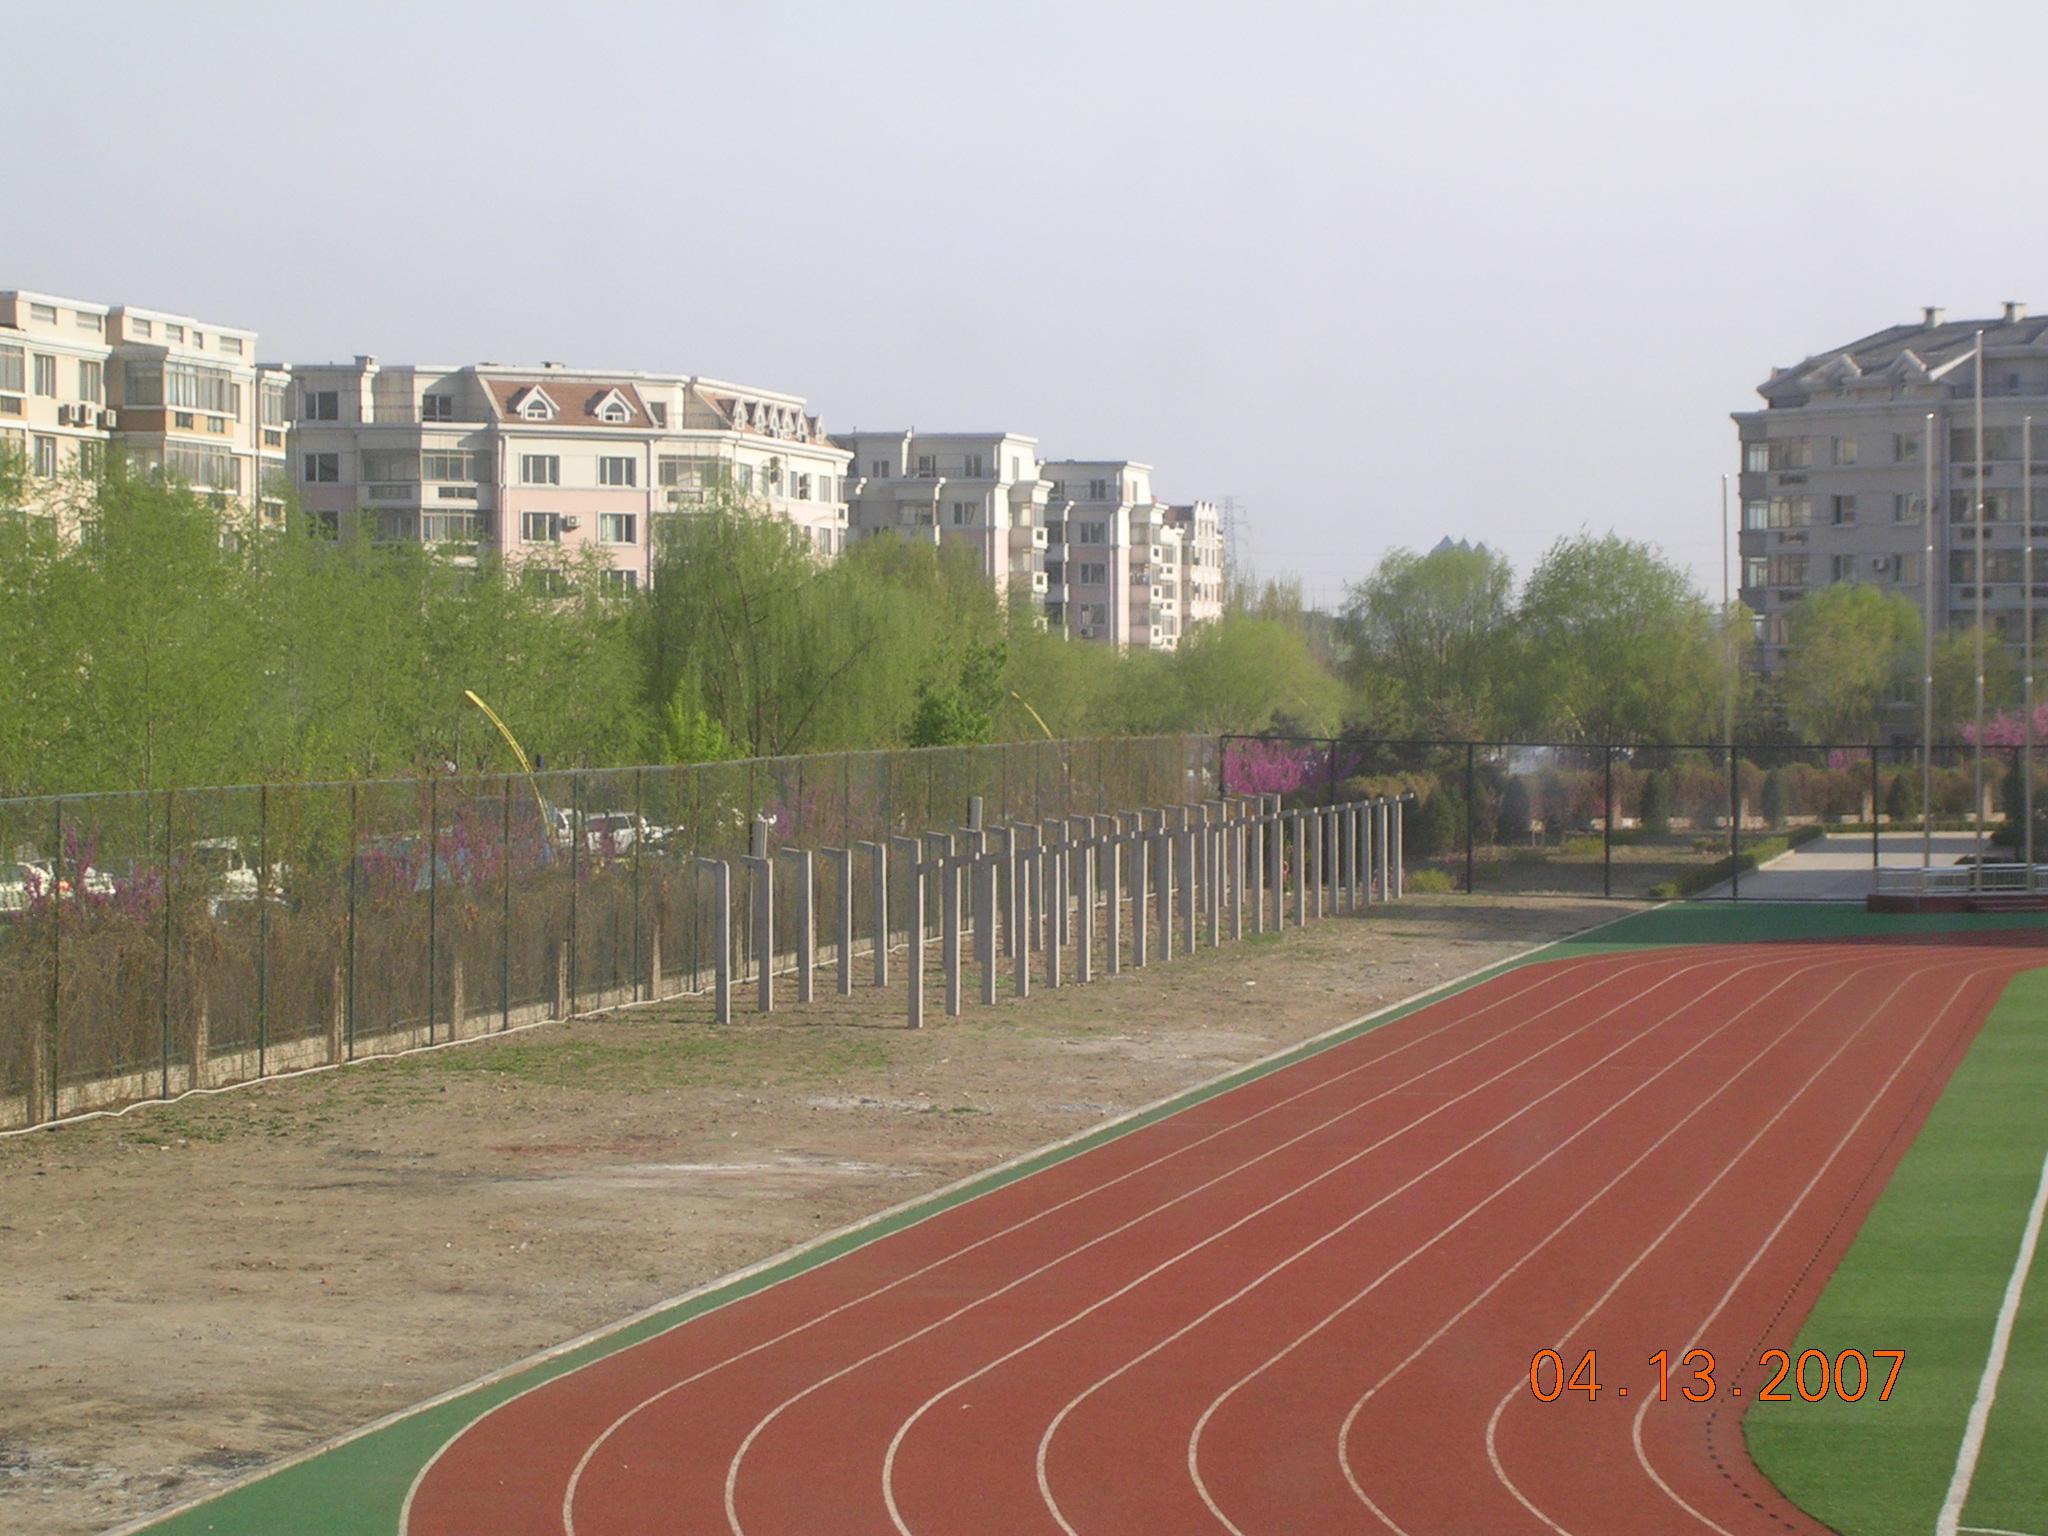 2007-04-14A 040.jpg